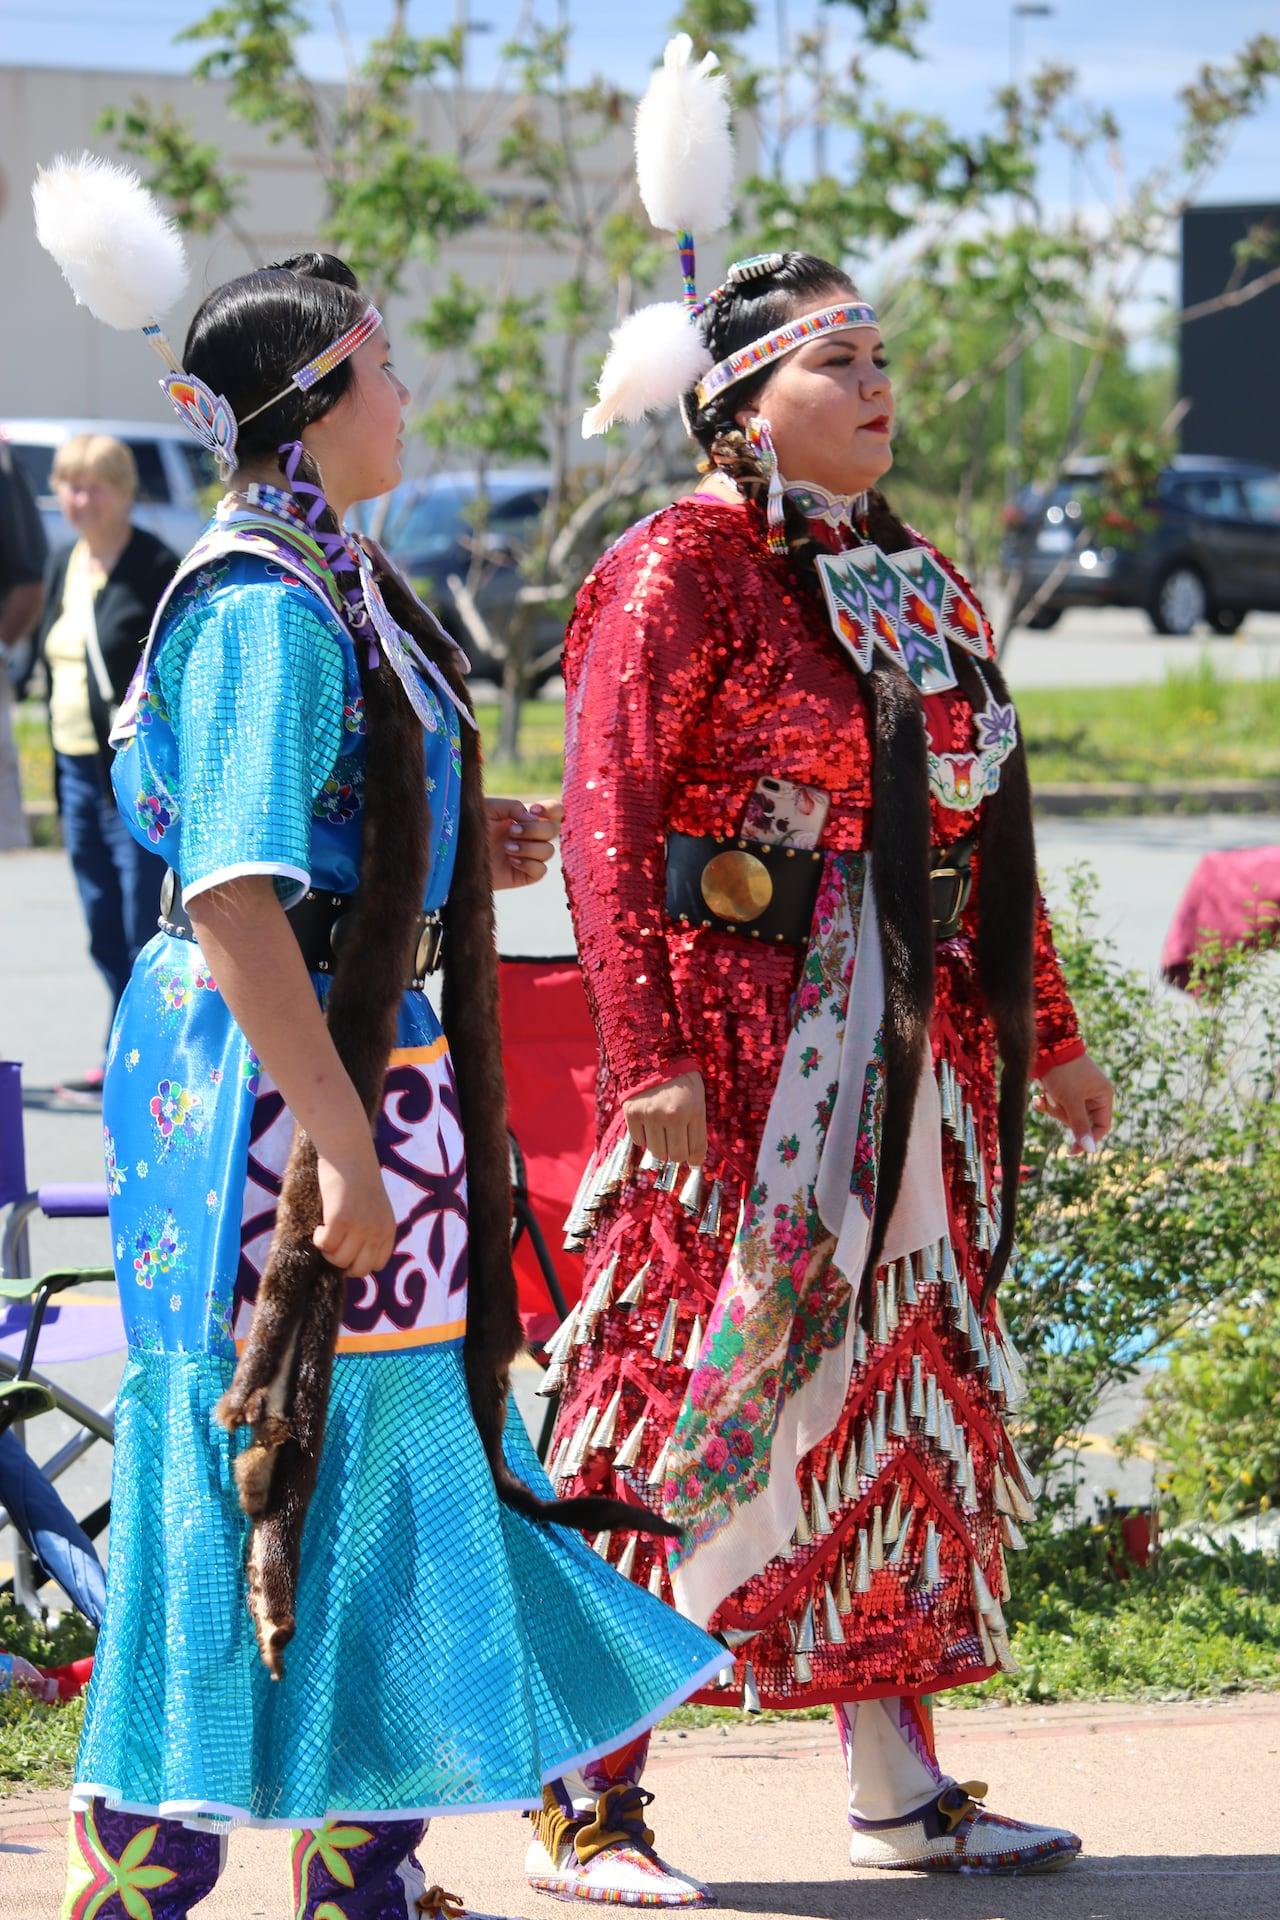 It's not a costume': Mi'kmaq 'jingle sisters' reflect on regalia and